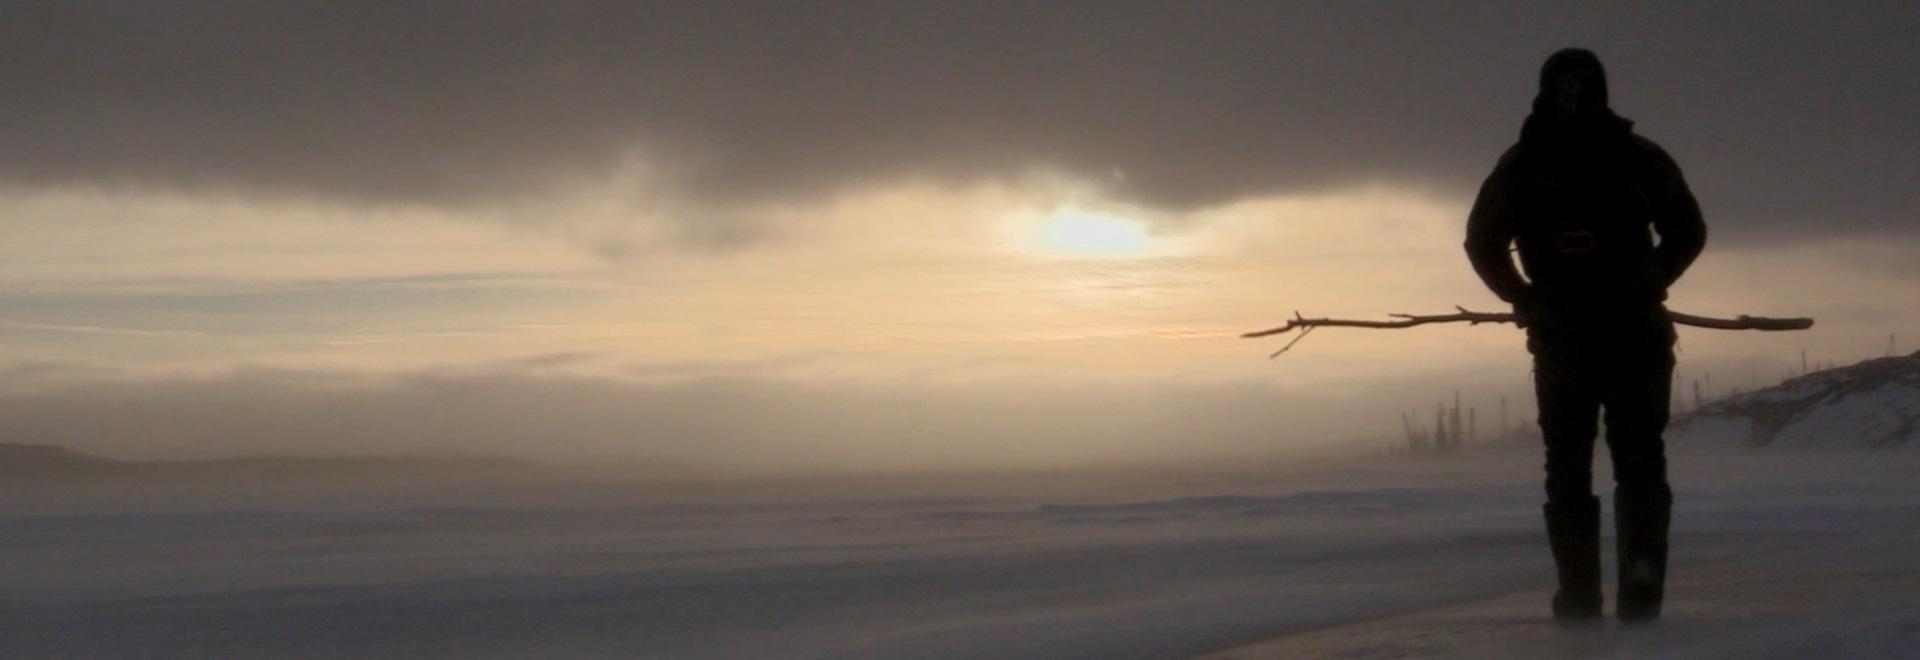 Freddo Artico